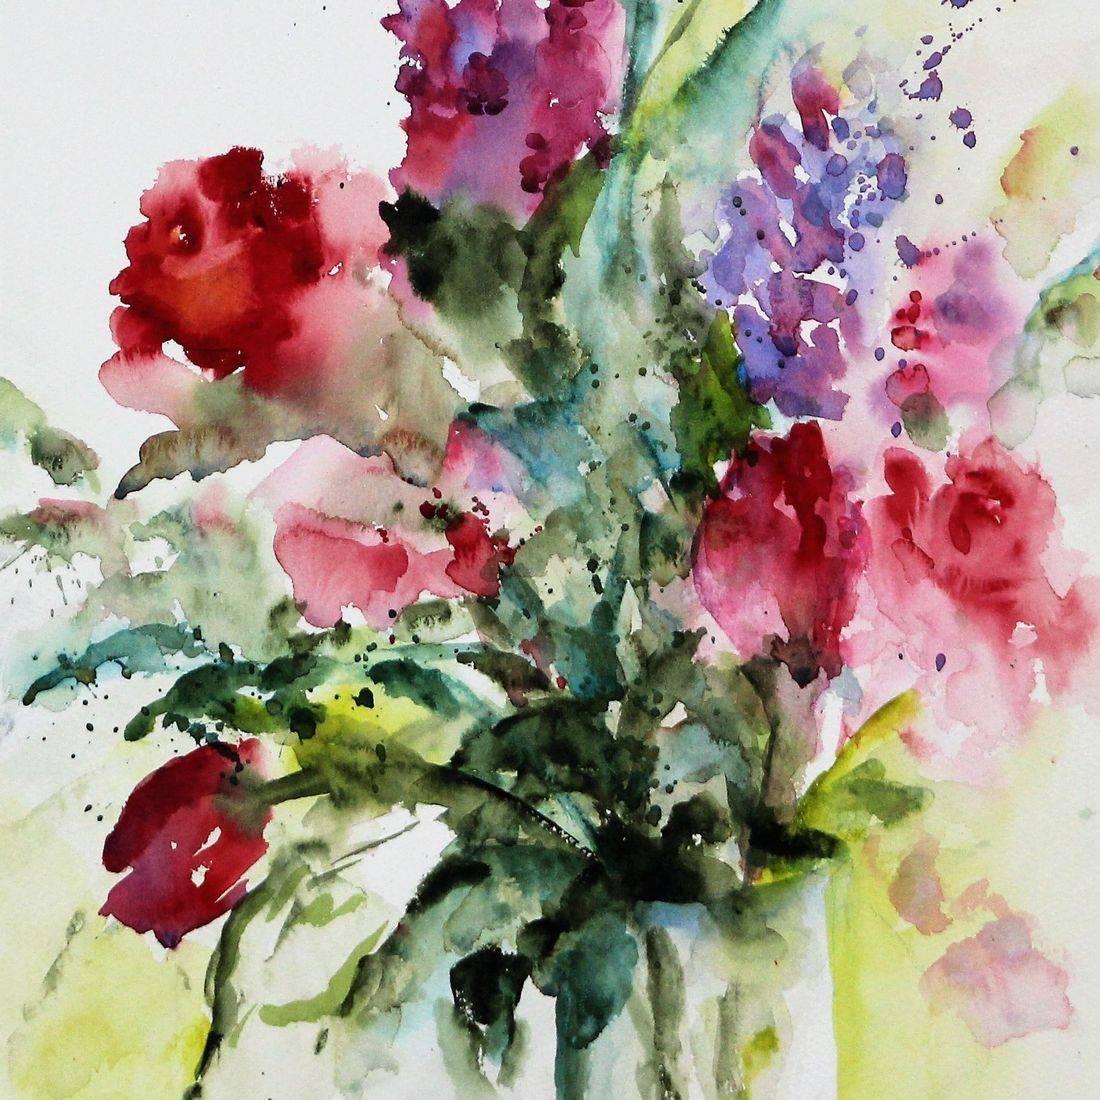 R Putbrese Watercolor, Rebecca Krutsinger watercolor painting of Floral mixed flowers